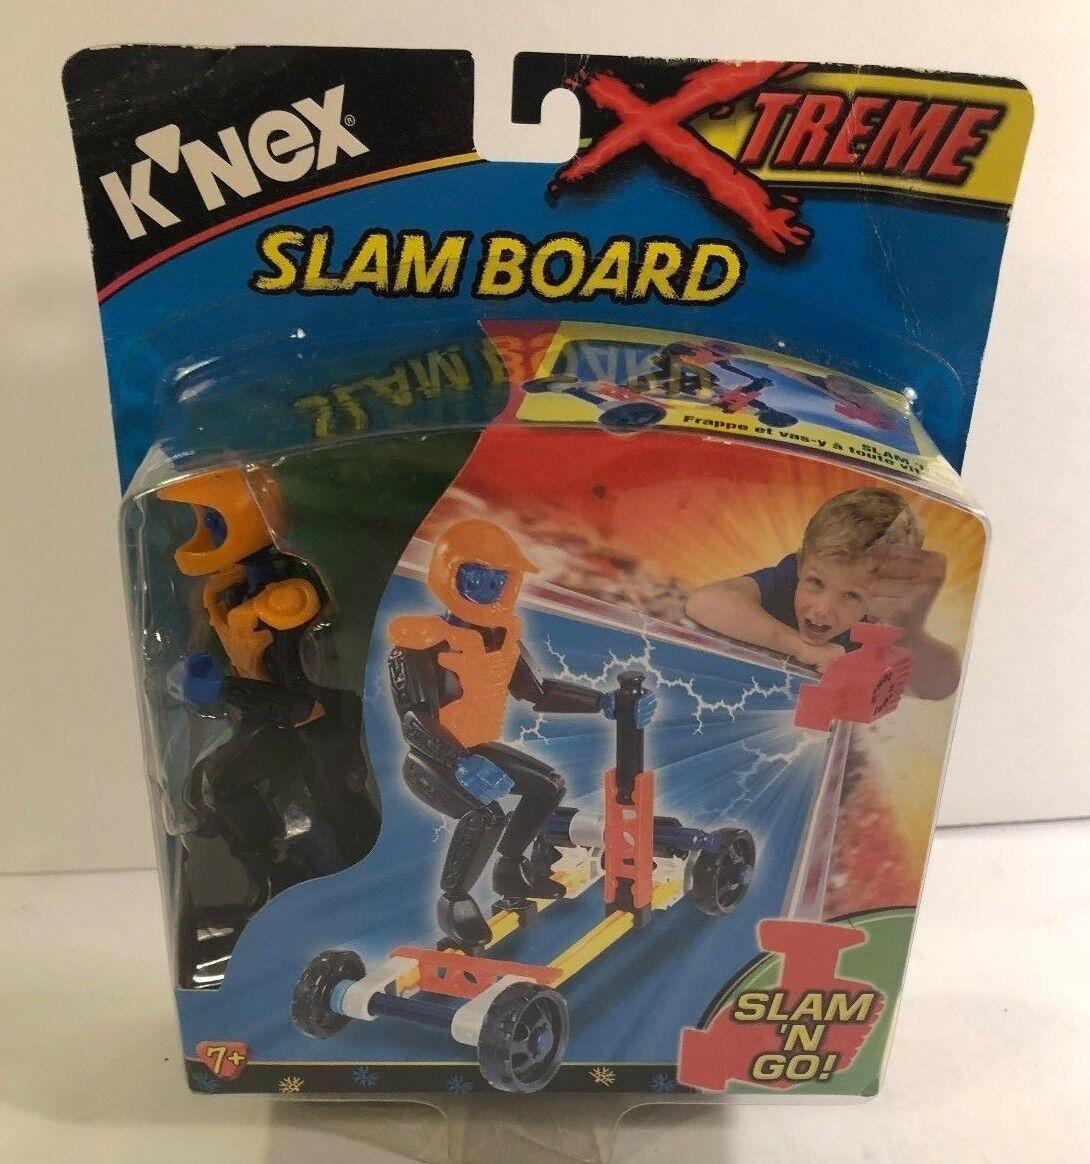 K'Nex Xtreme Slam Board Board Board 10519 31 Pieces Brand New On Card NOS 2001 Rare 6cc446